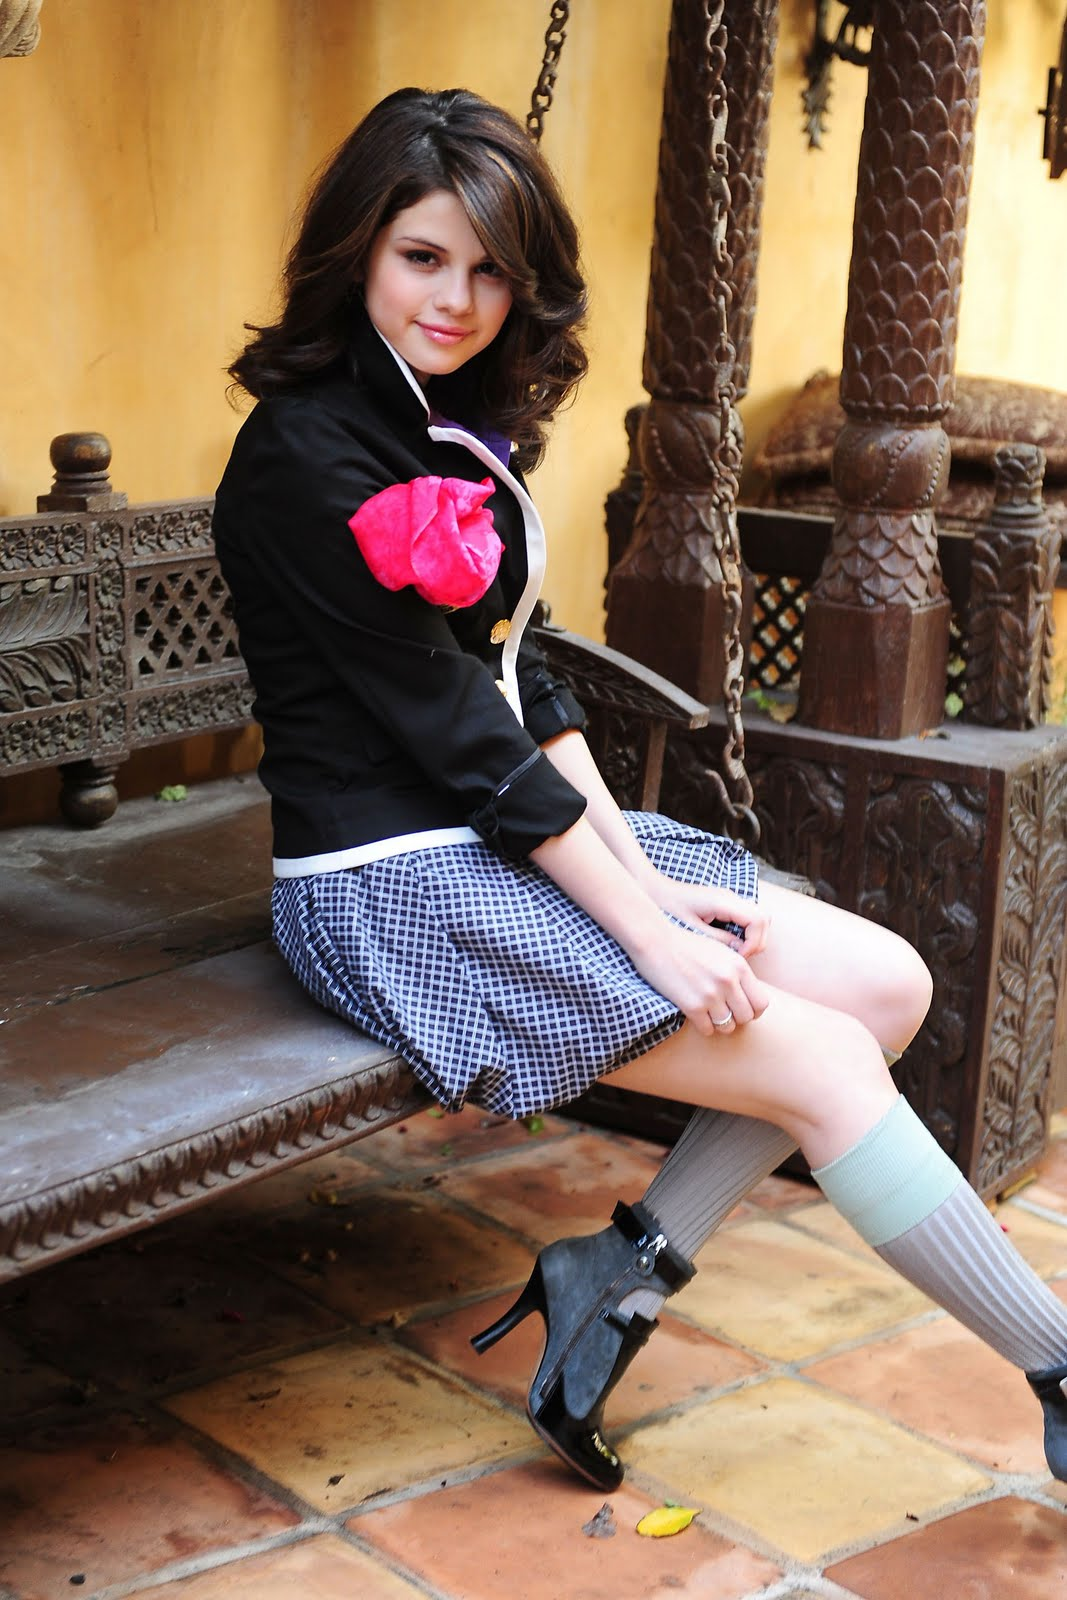 http://3.bp.blogspot.com/-jI5XLe6ydoI/TdU3pMmN2oI/AAAAAAAAB64/LwjVOcOP0_s/s1600/Selena_Gomez_.jpg